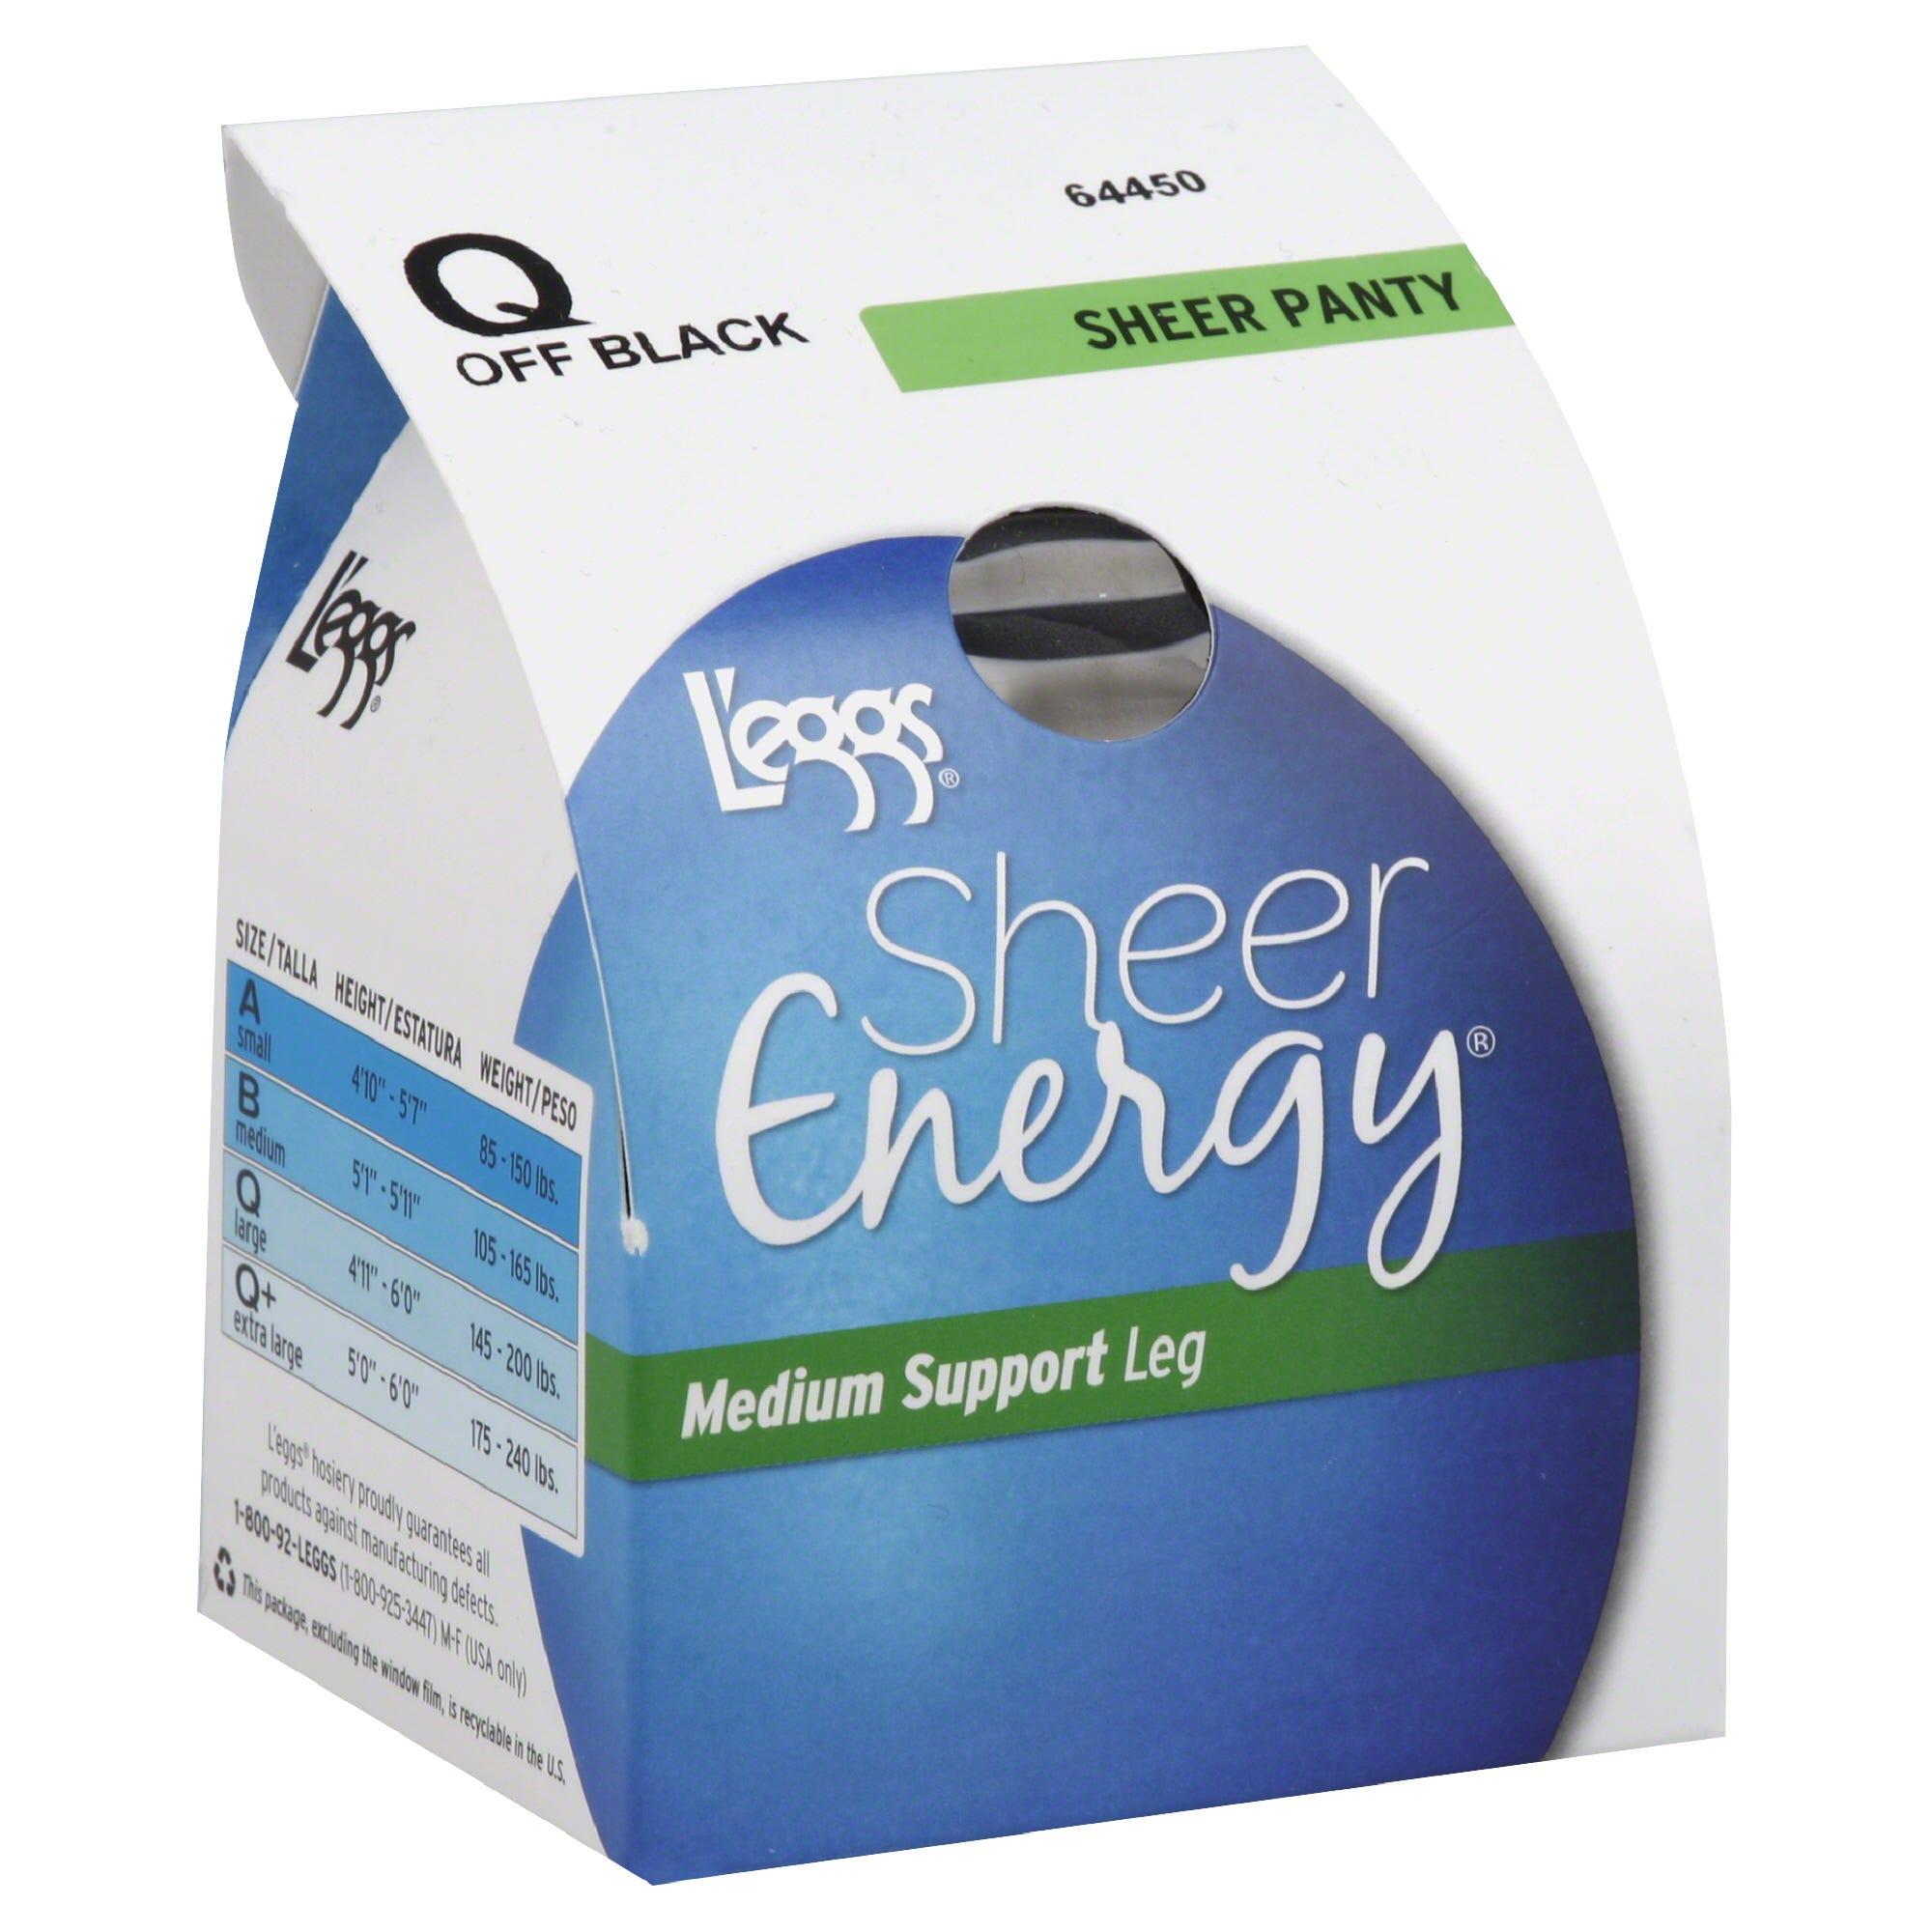 Leggs 4 Pair Size Q Sheer Energy Pantyhose Sheer Toe Off Black